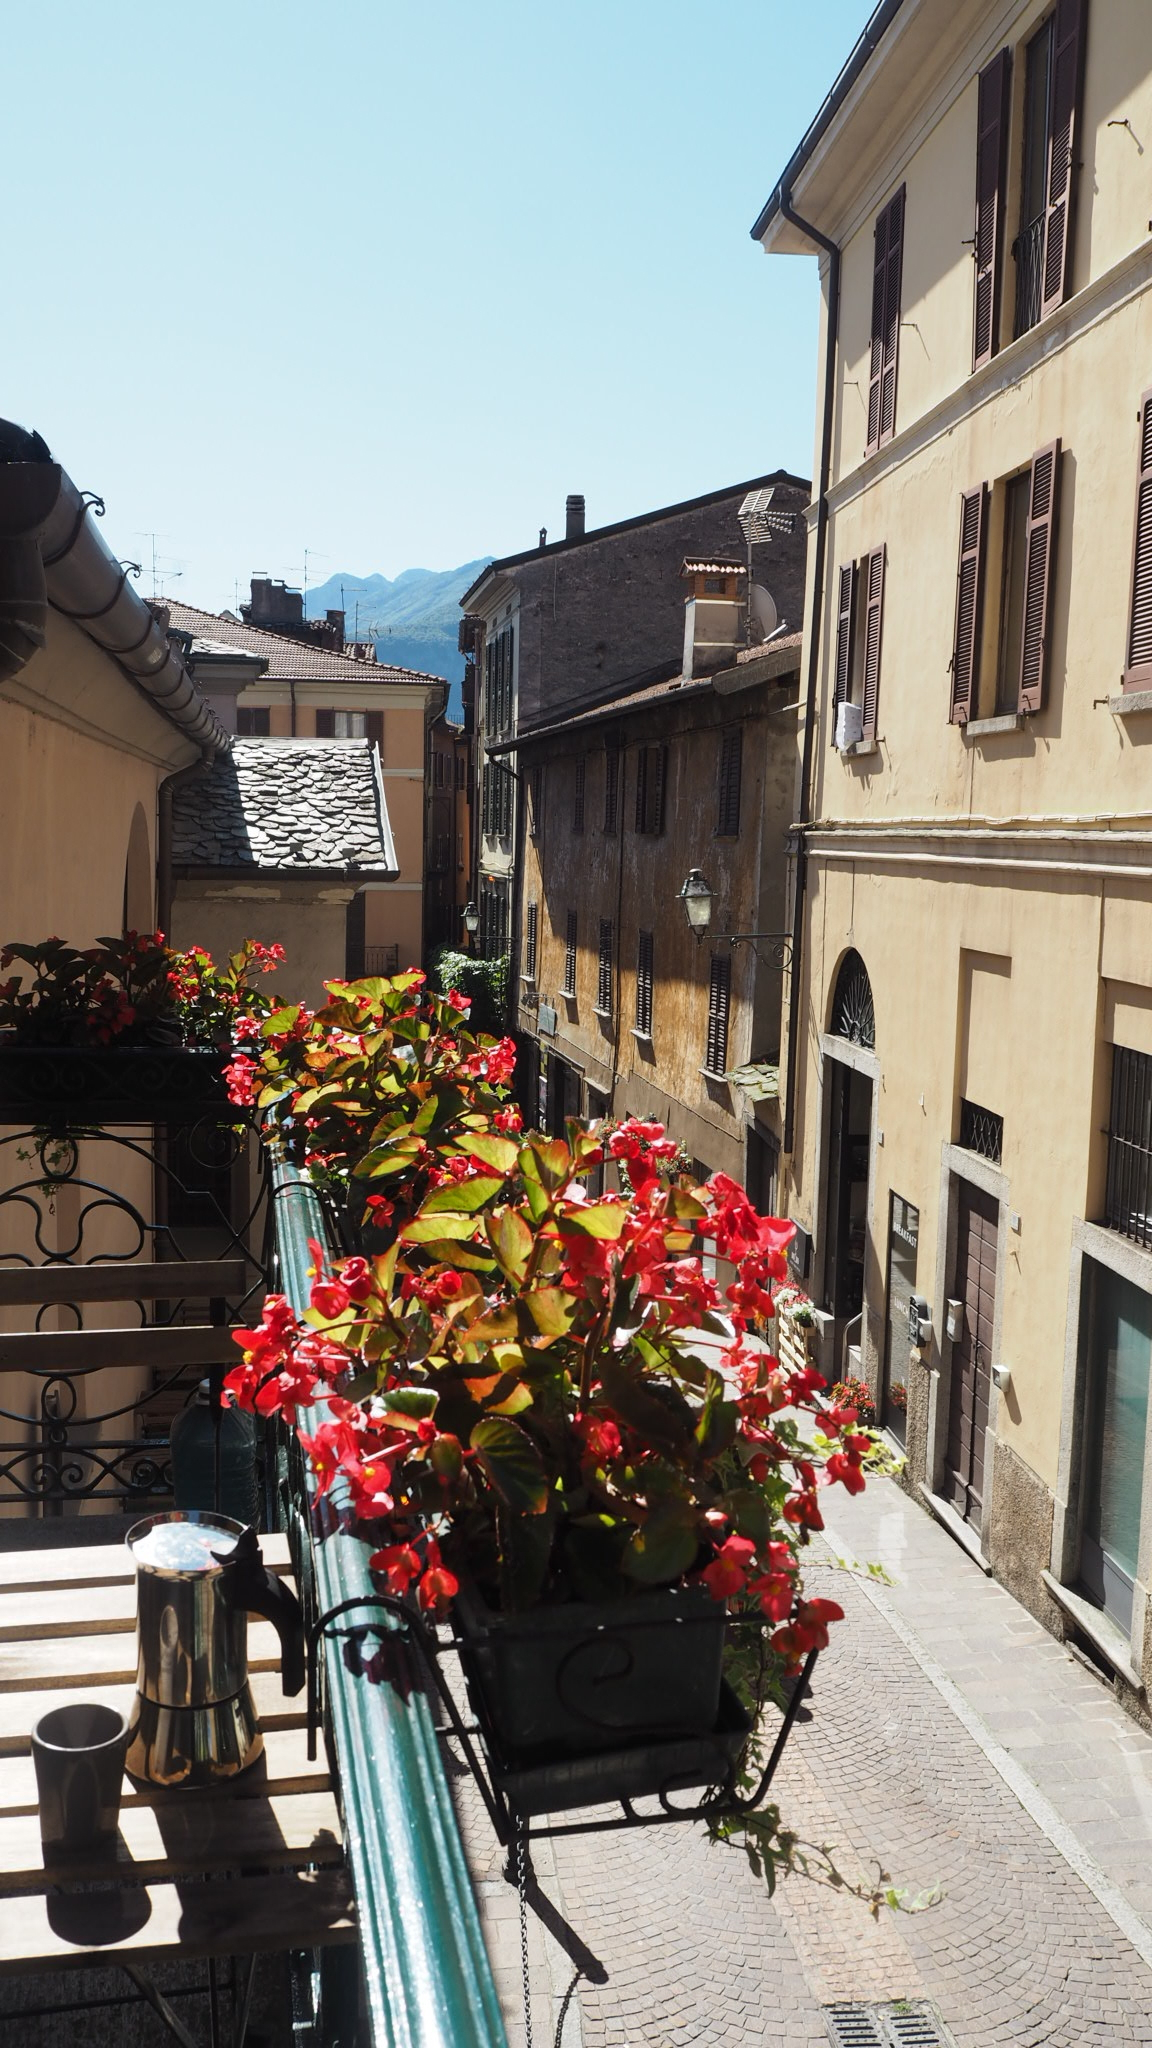 Mornings in Menaggio